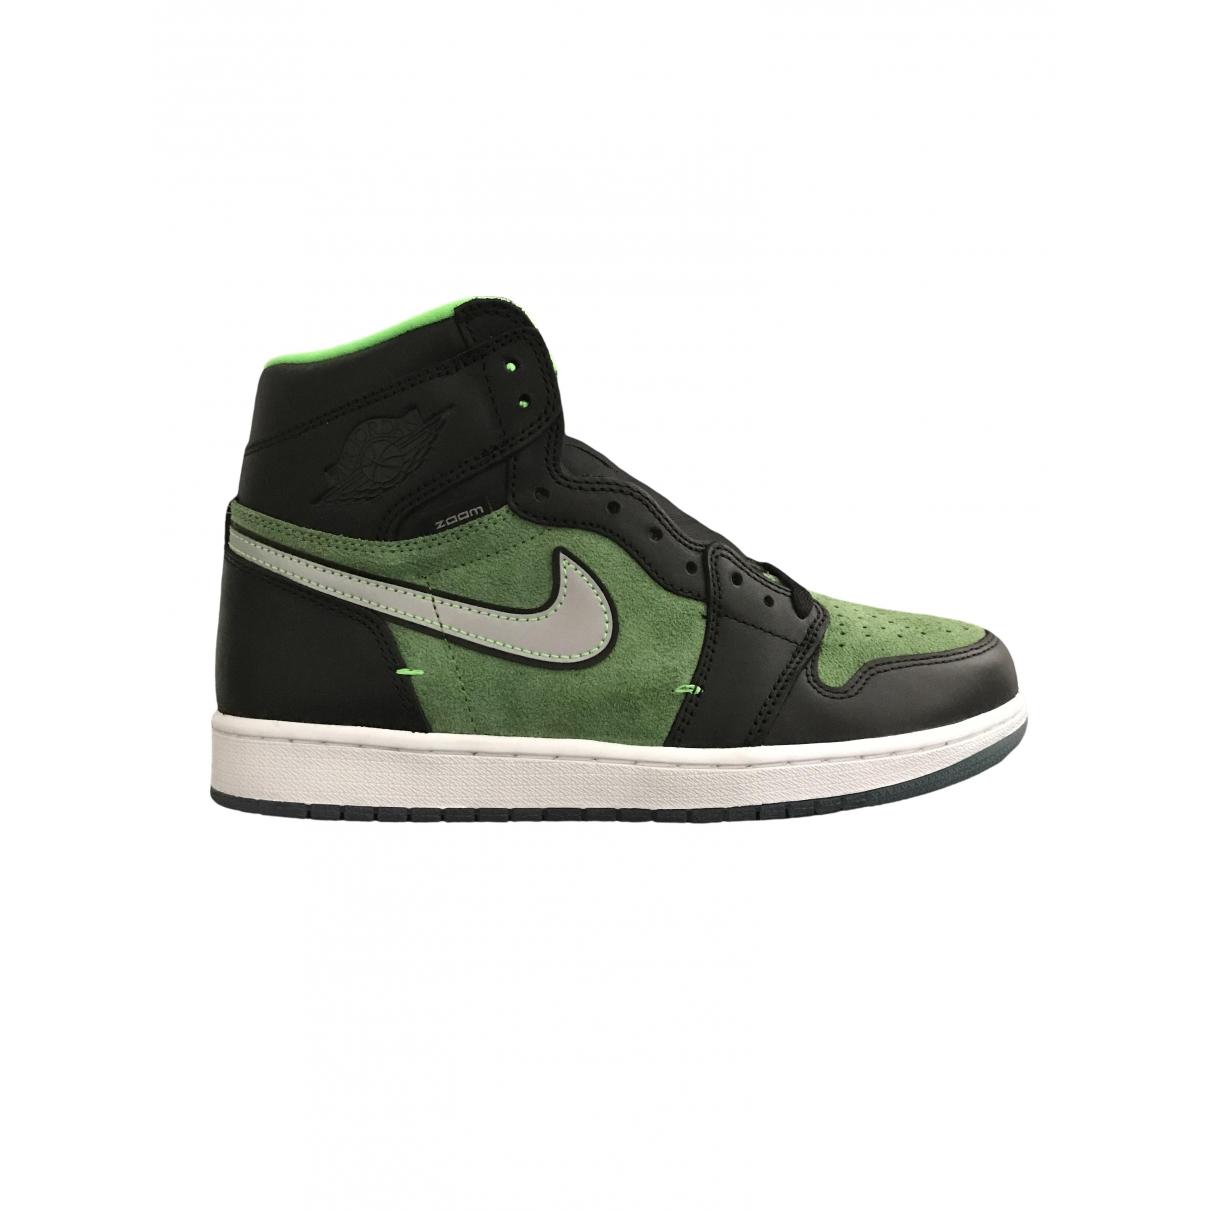 Jordan - Baskets Air Jordan 1  pour homme en suede - vert